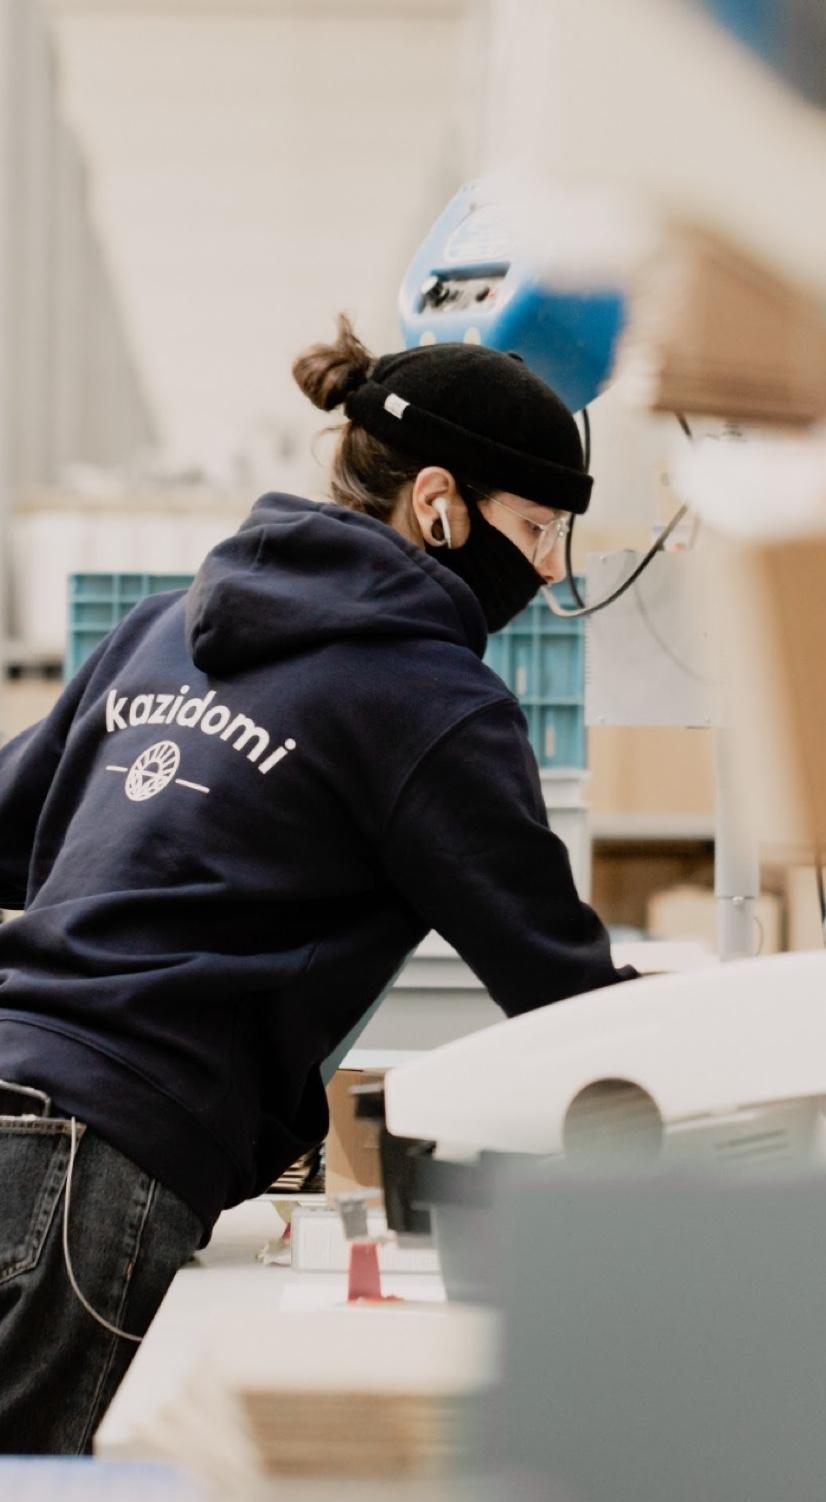 Préparation colis livraison Kazidomi